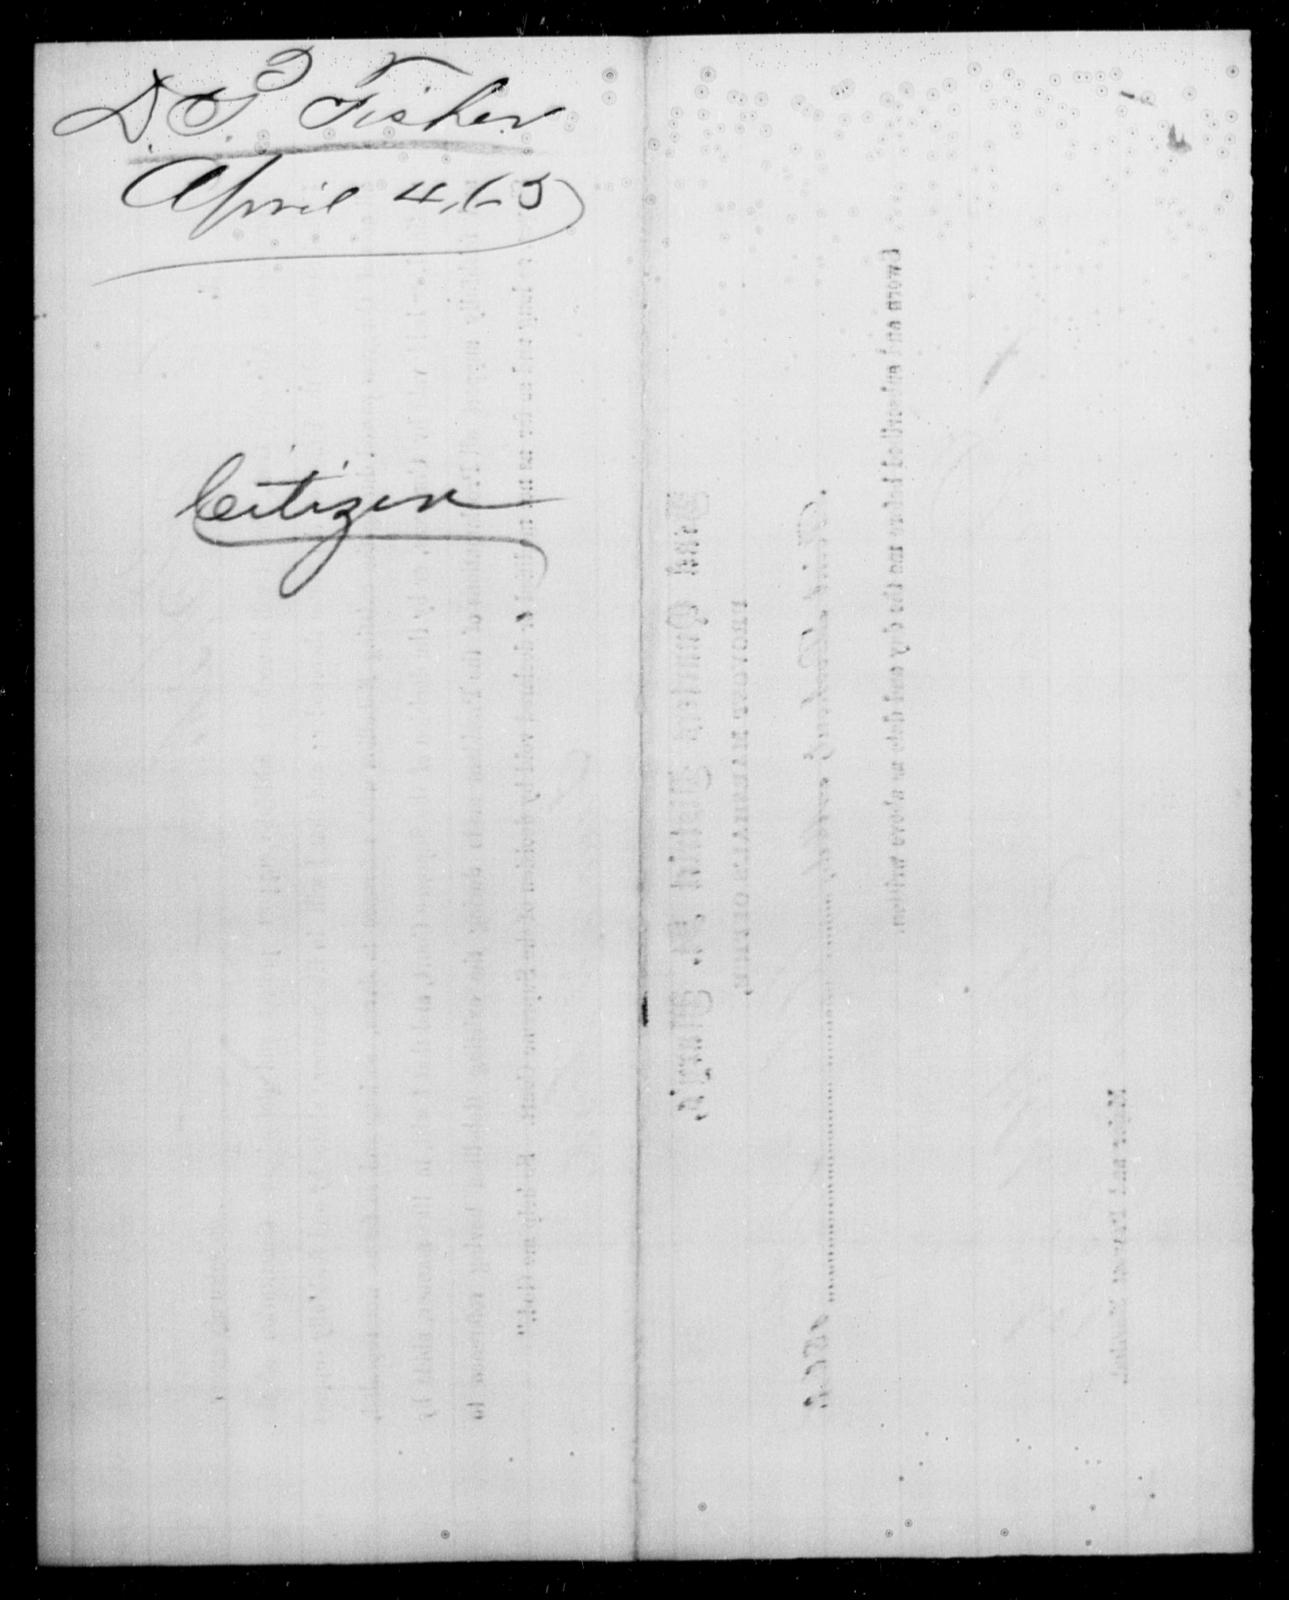 Fisher, Danore P - State: Maryland - Year: 1865